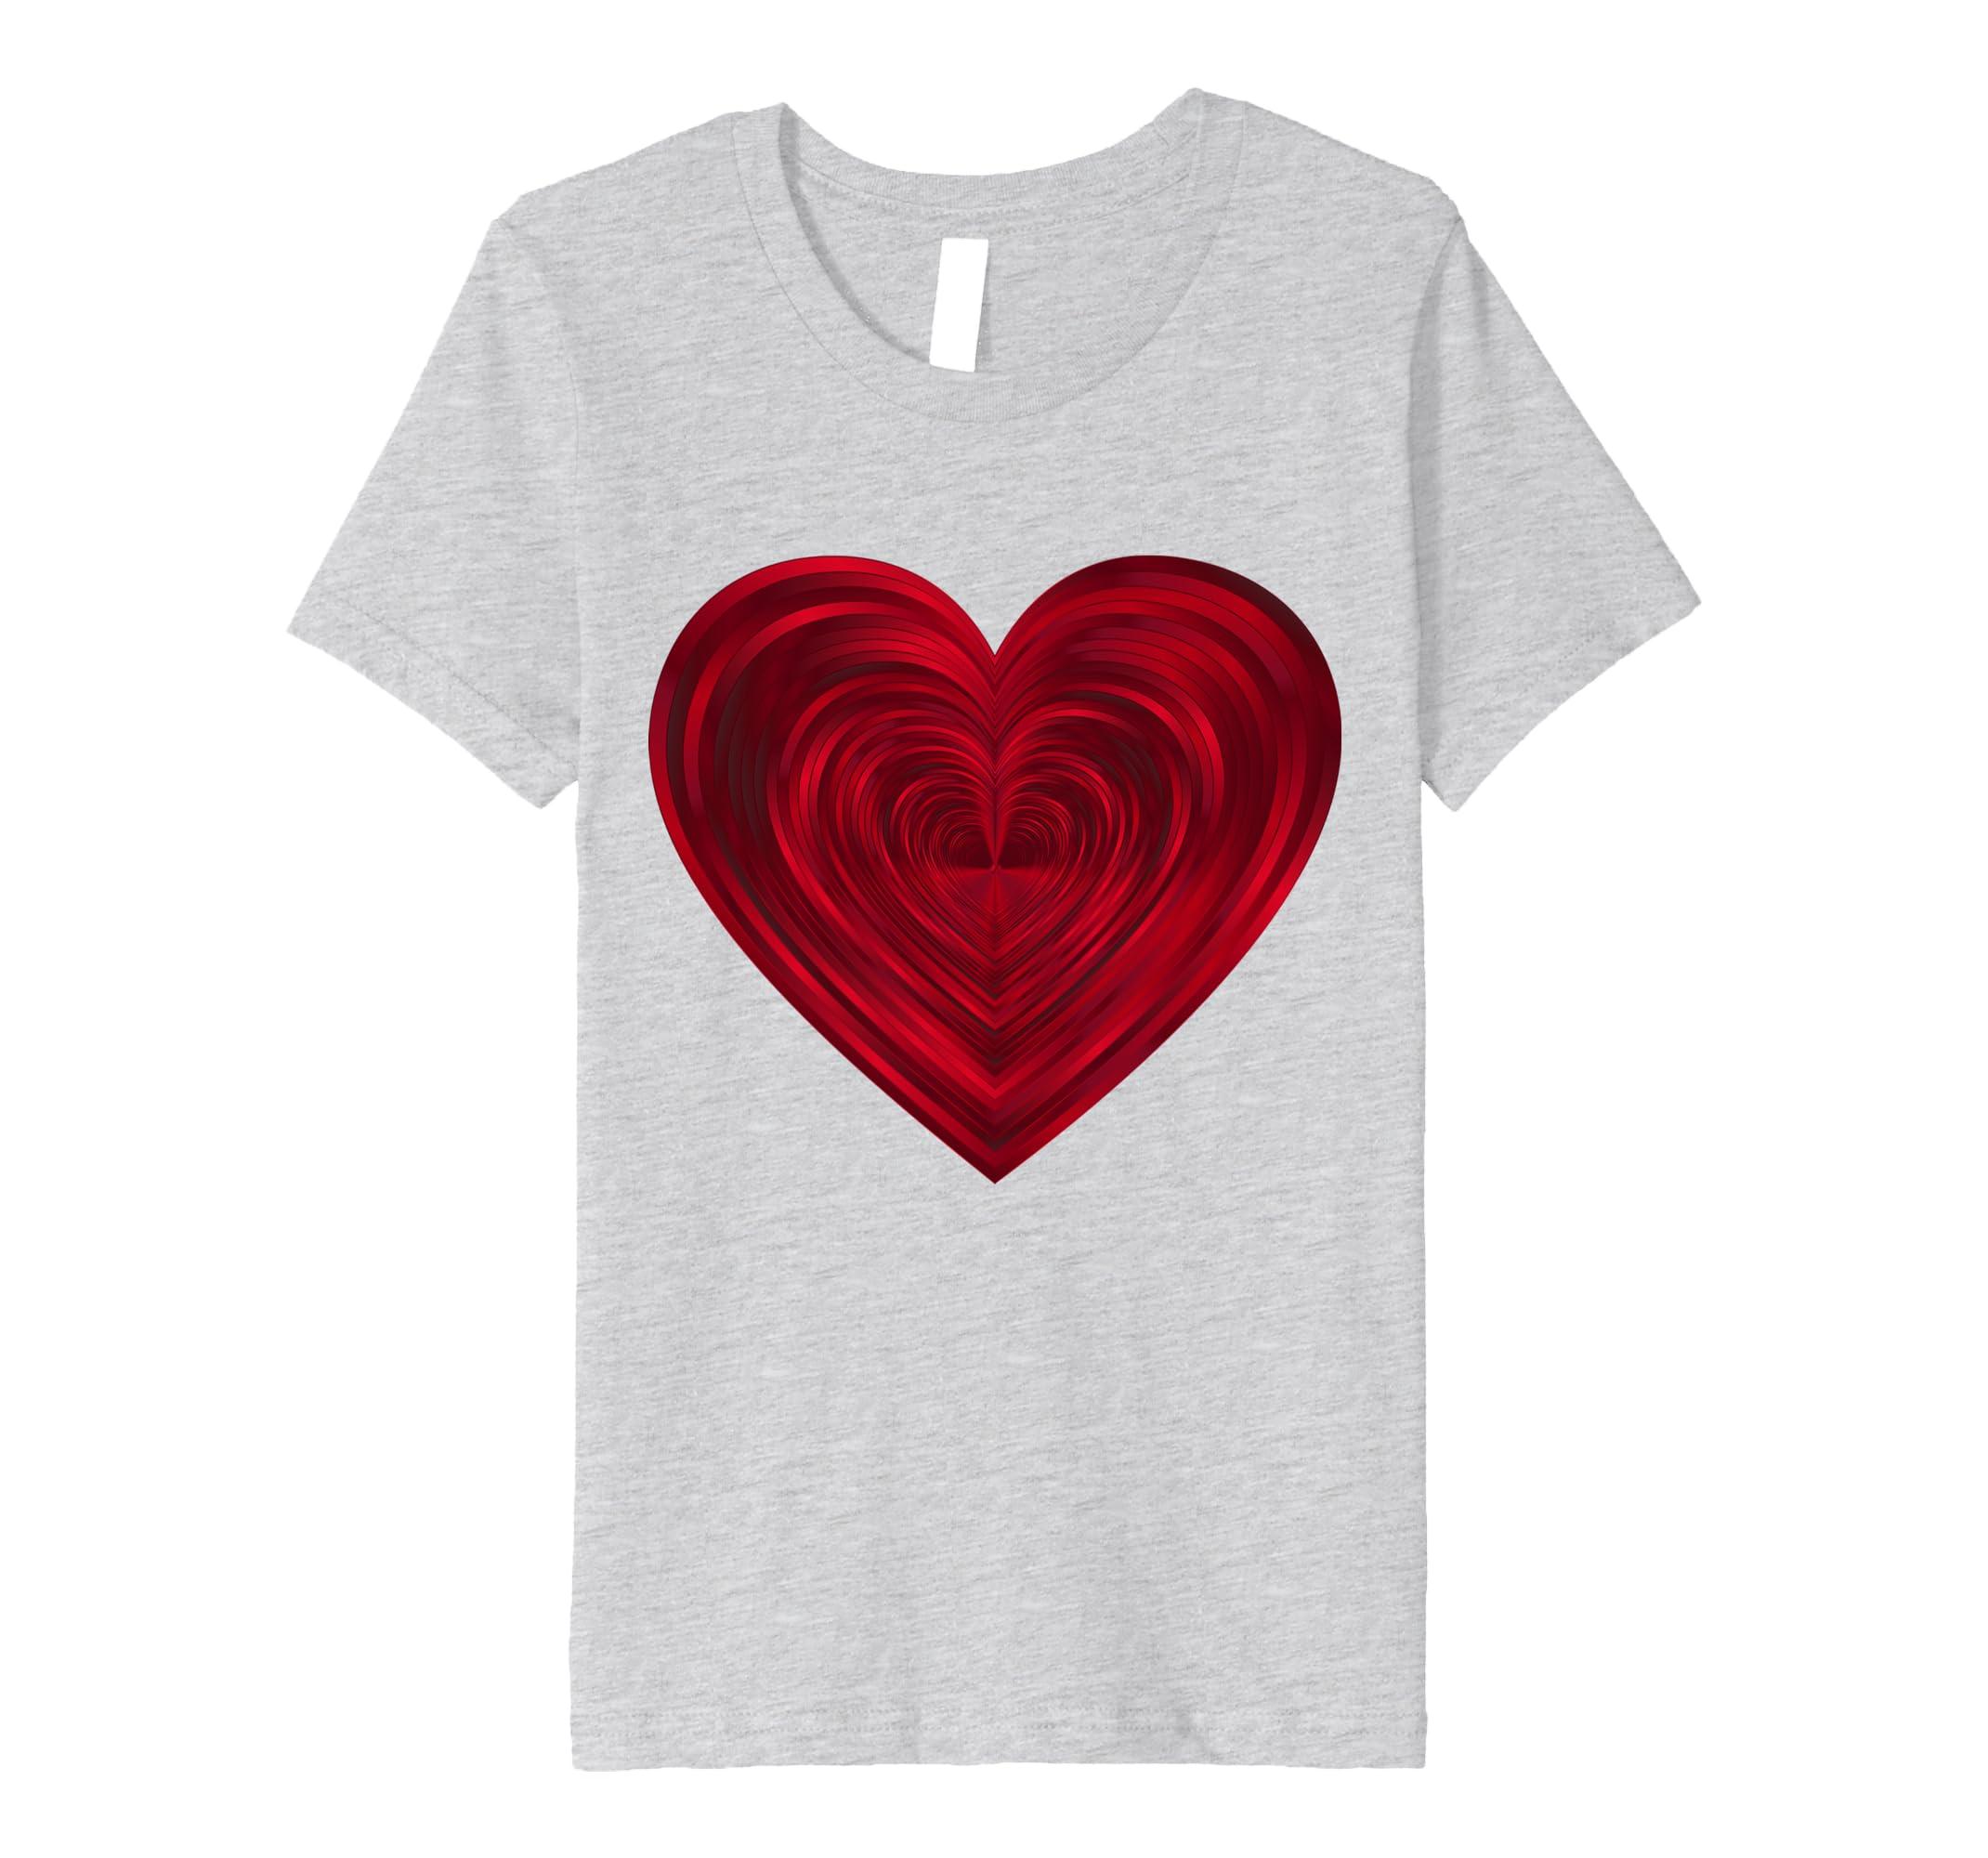 Amazon.com  Big Red Heart T Shirt Classic Valentine s Day Women Men Kids   Clothing 4026c2b4e5